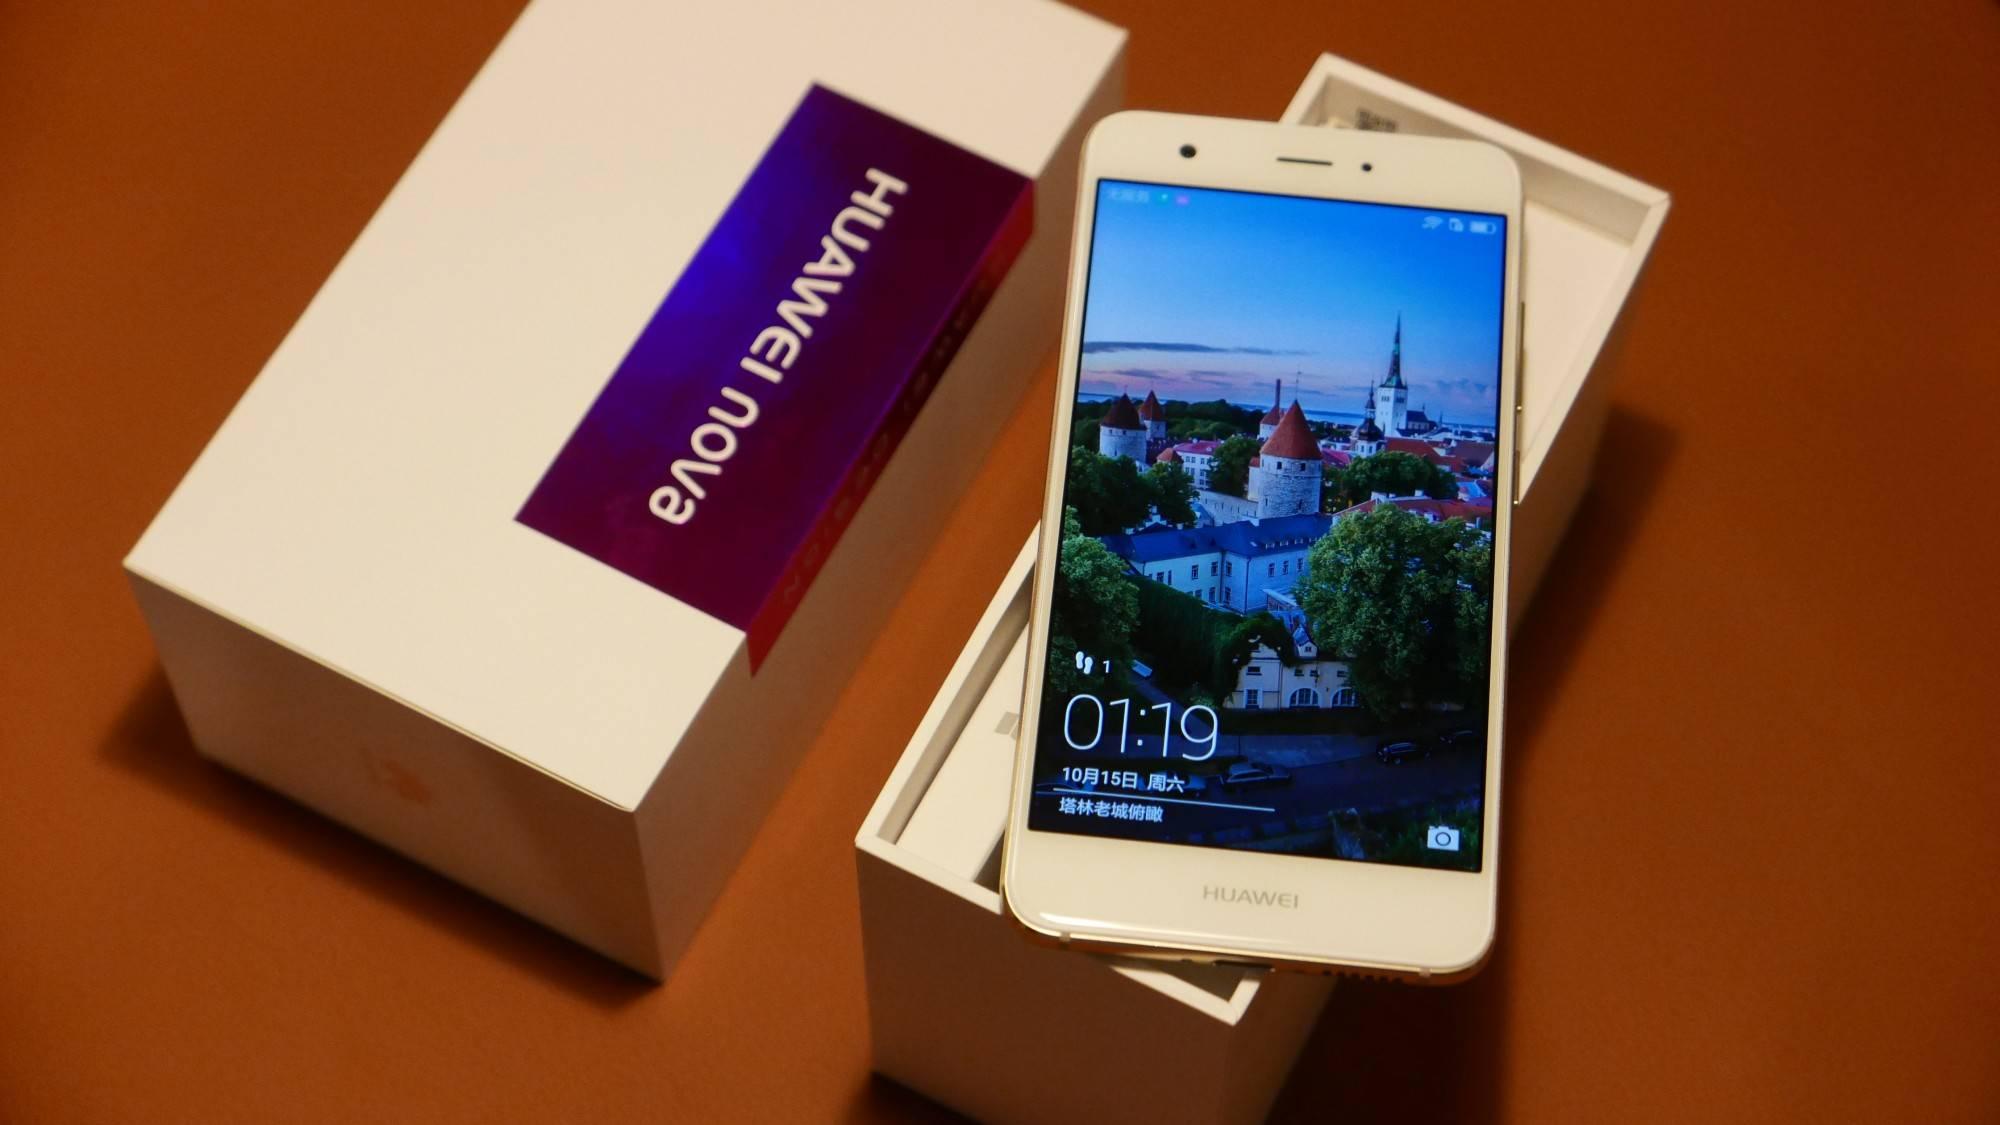 huawei mate P nova smartphone series Photo by hao ying 4